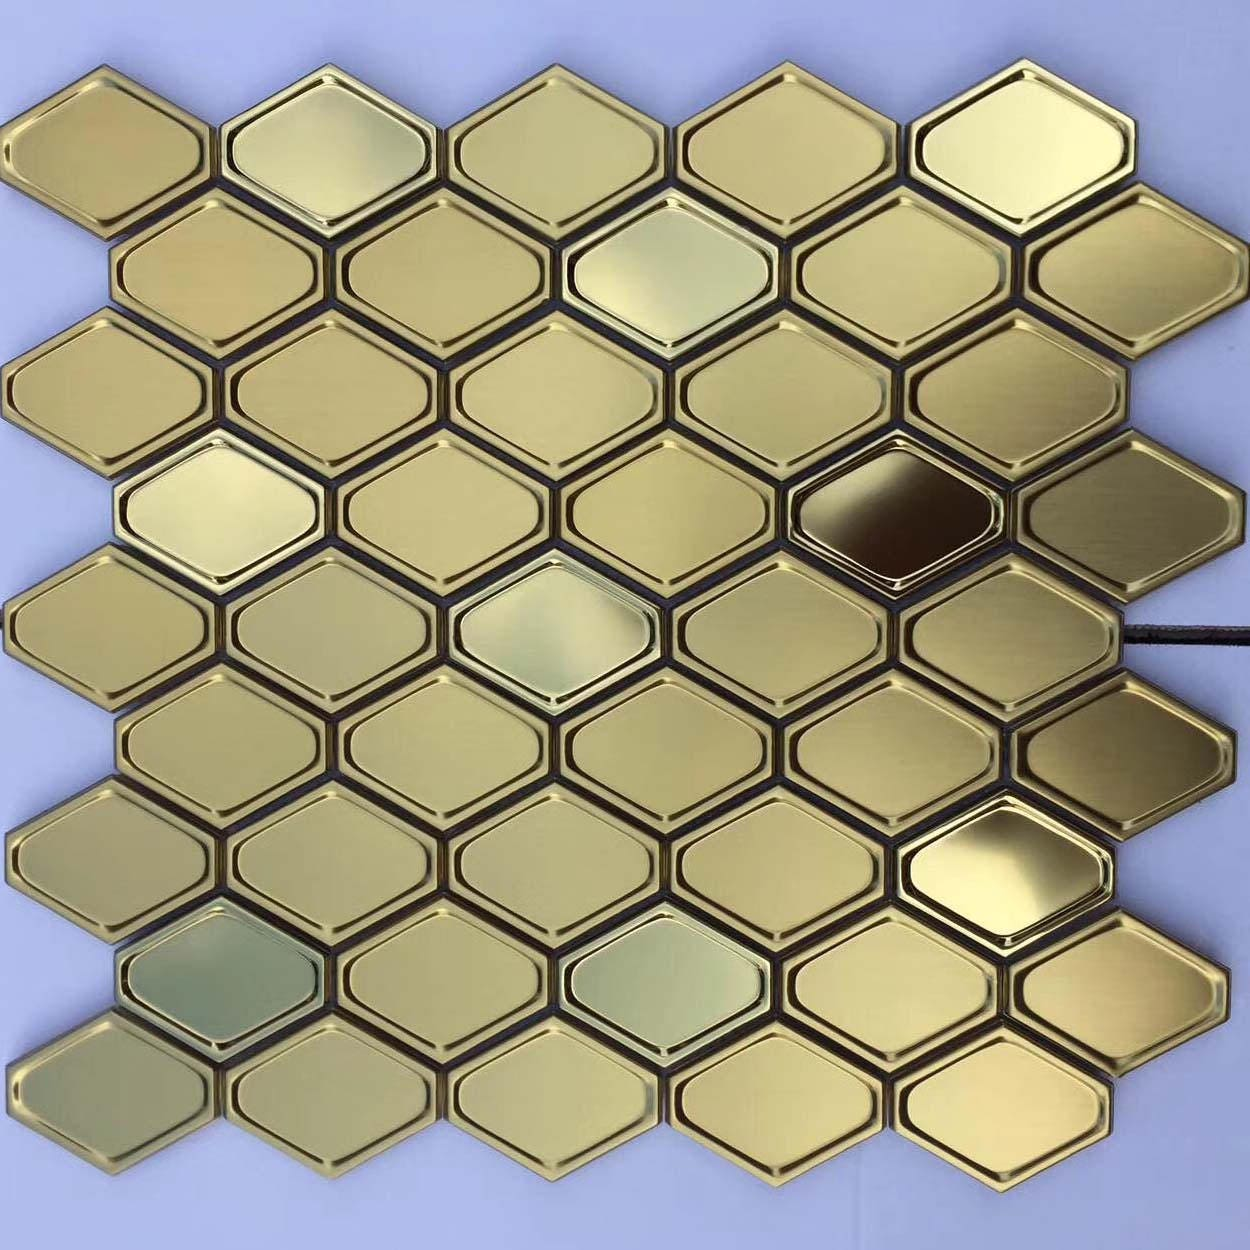 Metallic Mosaic Tile Hexagon Gold/Rose Gold/Silver Stainless